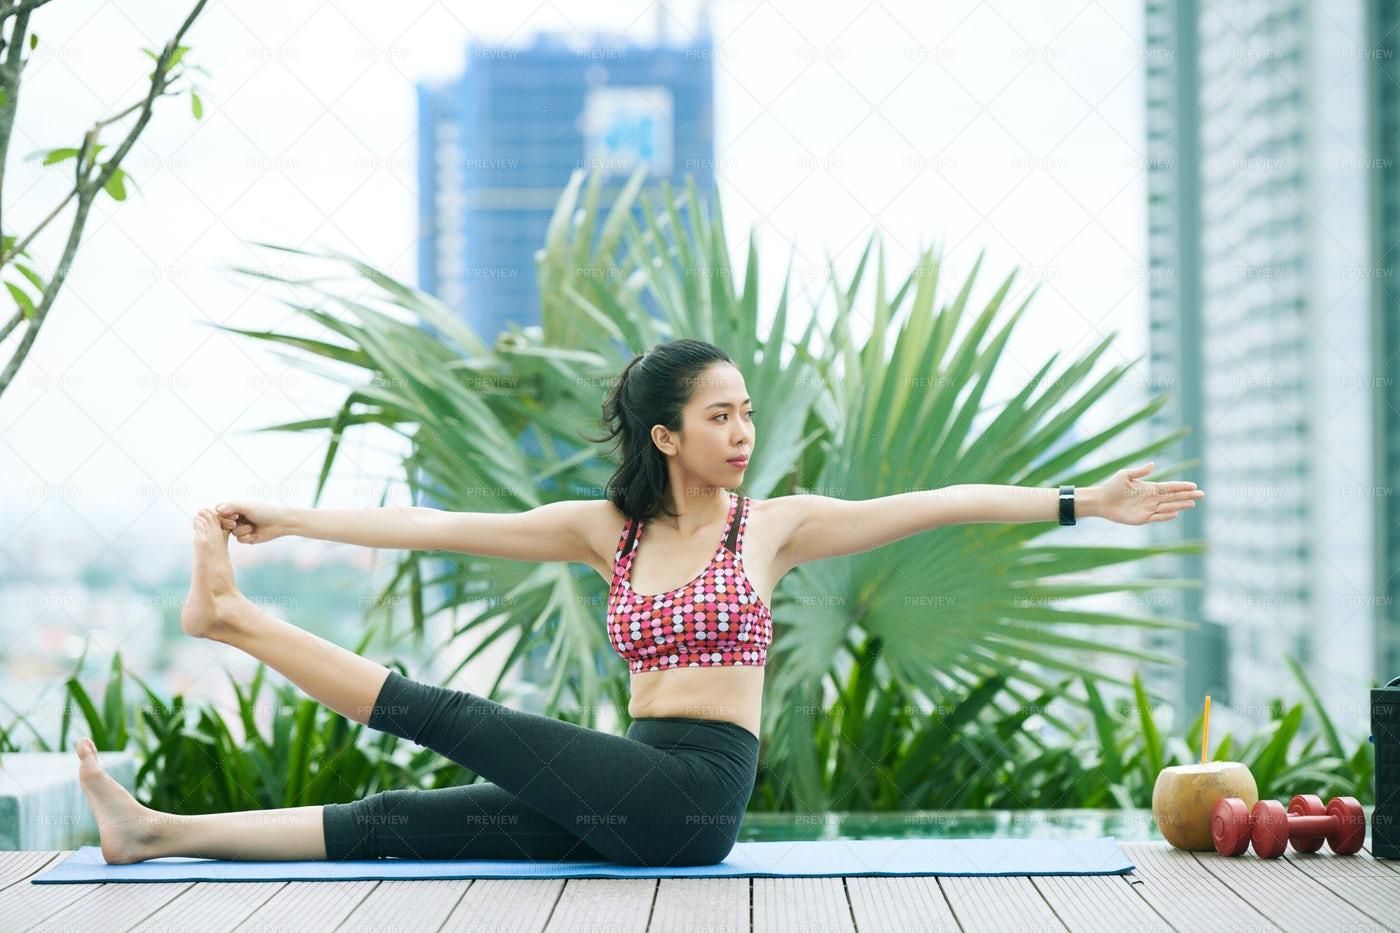 Healthy Woman Doing Exercise: Stock Photos